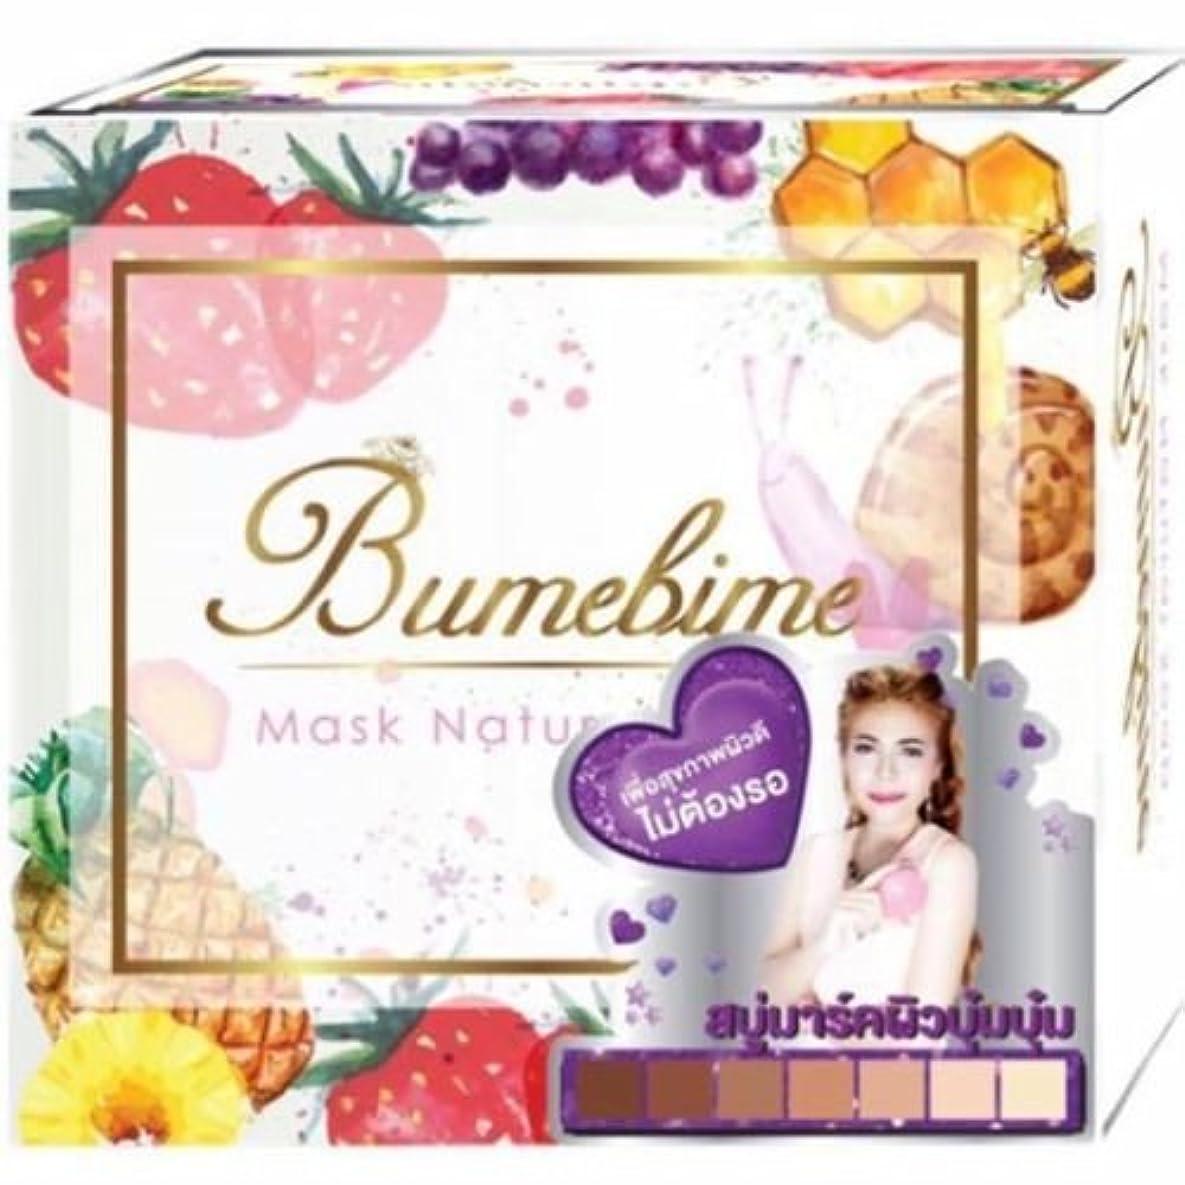 (1 x 100 g) bumebimeマスクNatural SoapスキンボディWhitening byトリプルW Shop